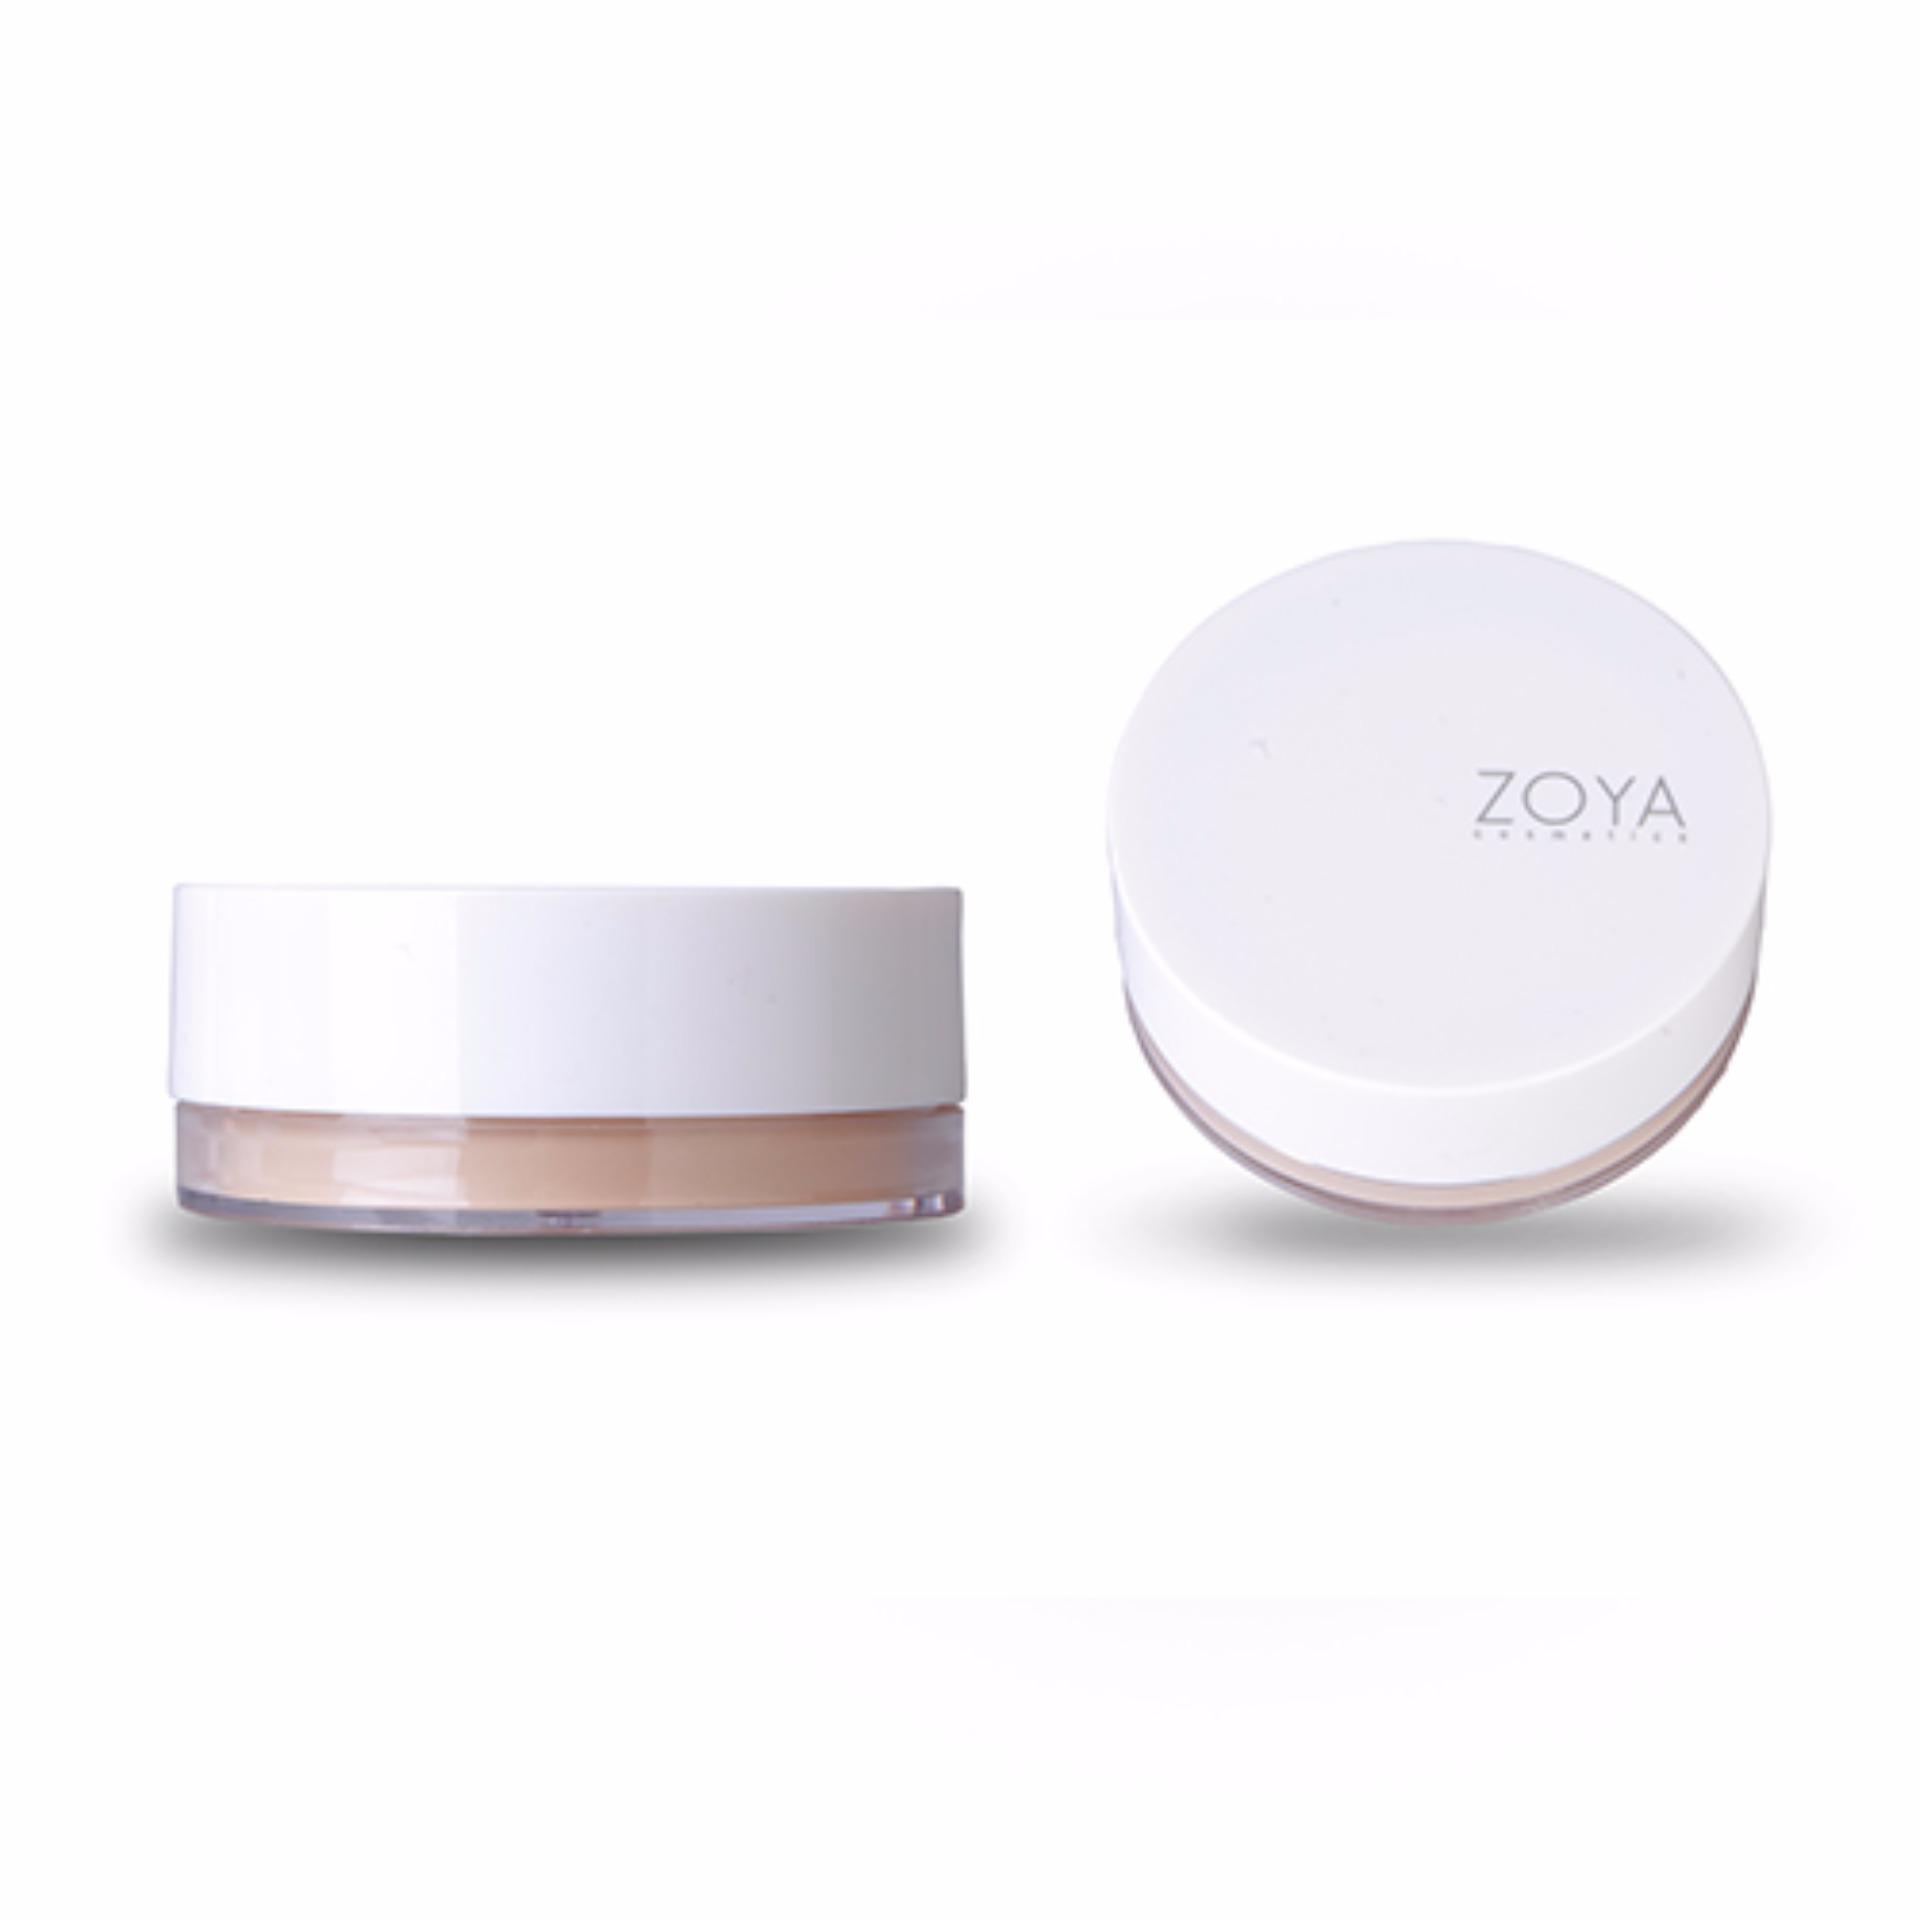 Zoya loose powder translucent 1851 69380231